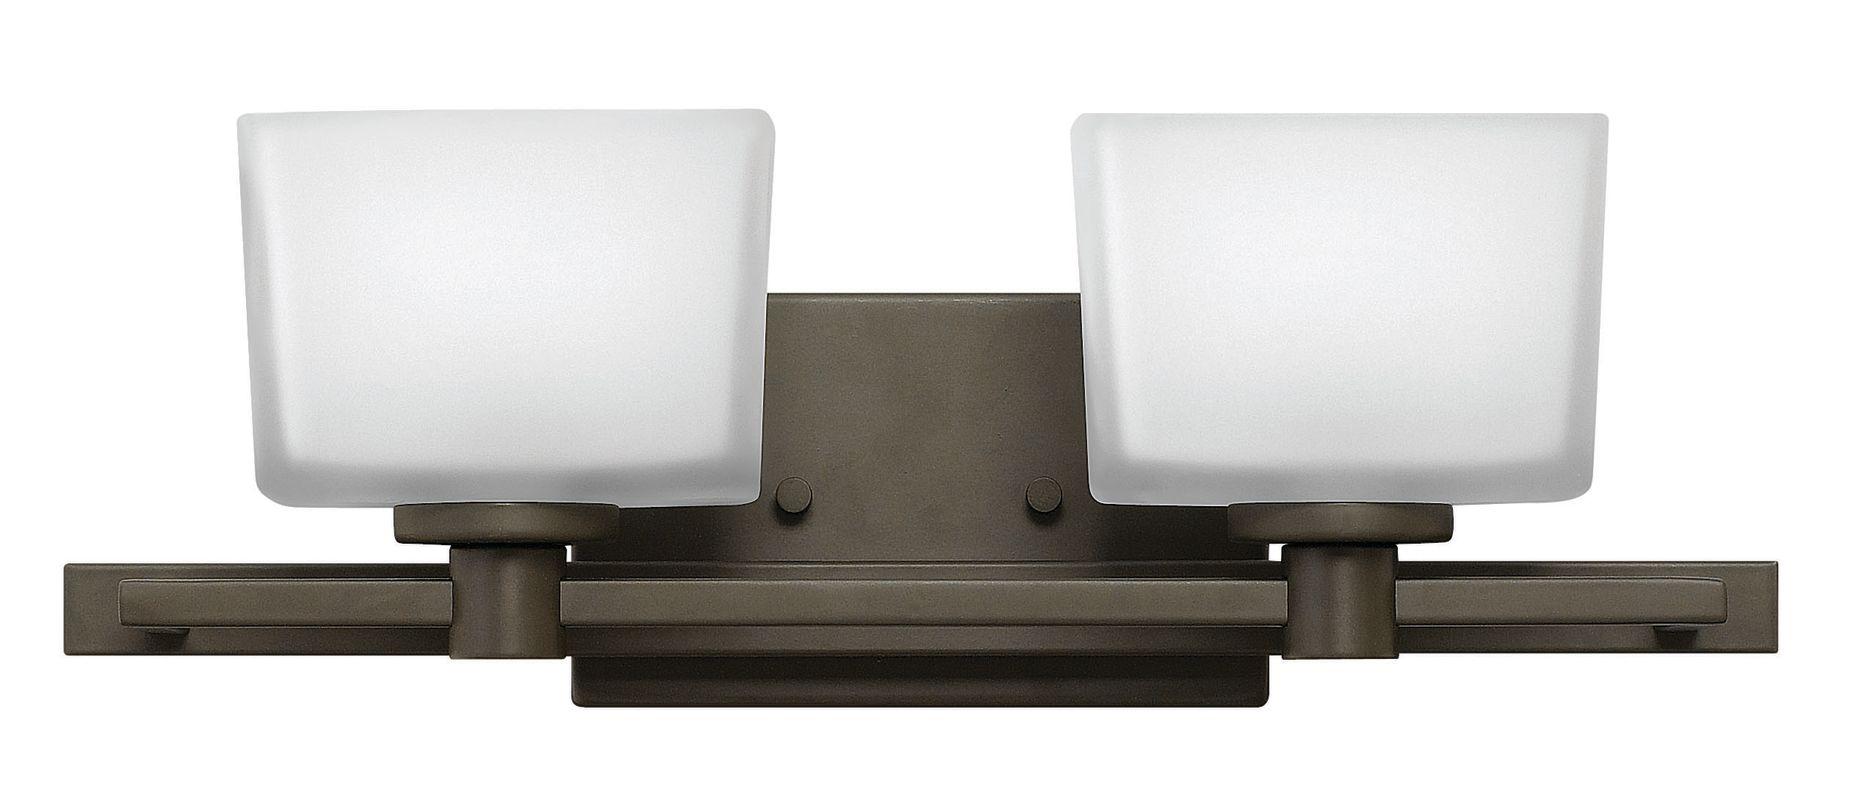 Hinkley Lighting 5022 2 Light Bathroom Vanity Light from the Taylor Sale $175.00 ITEM: bci2635481 ID#:5022KZ UPC: 640665502220 :